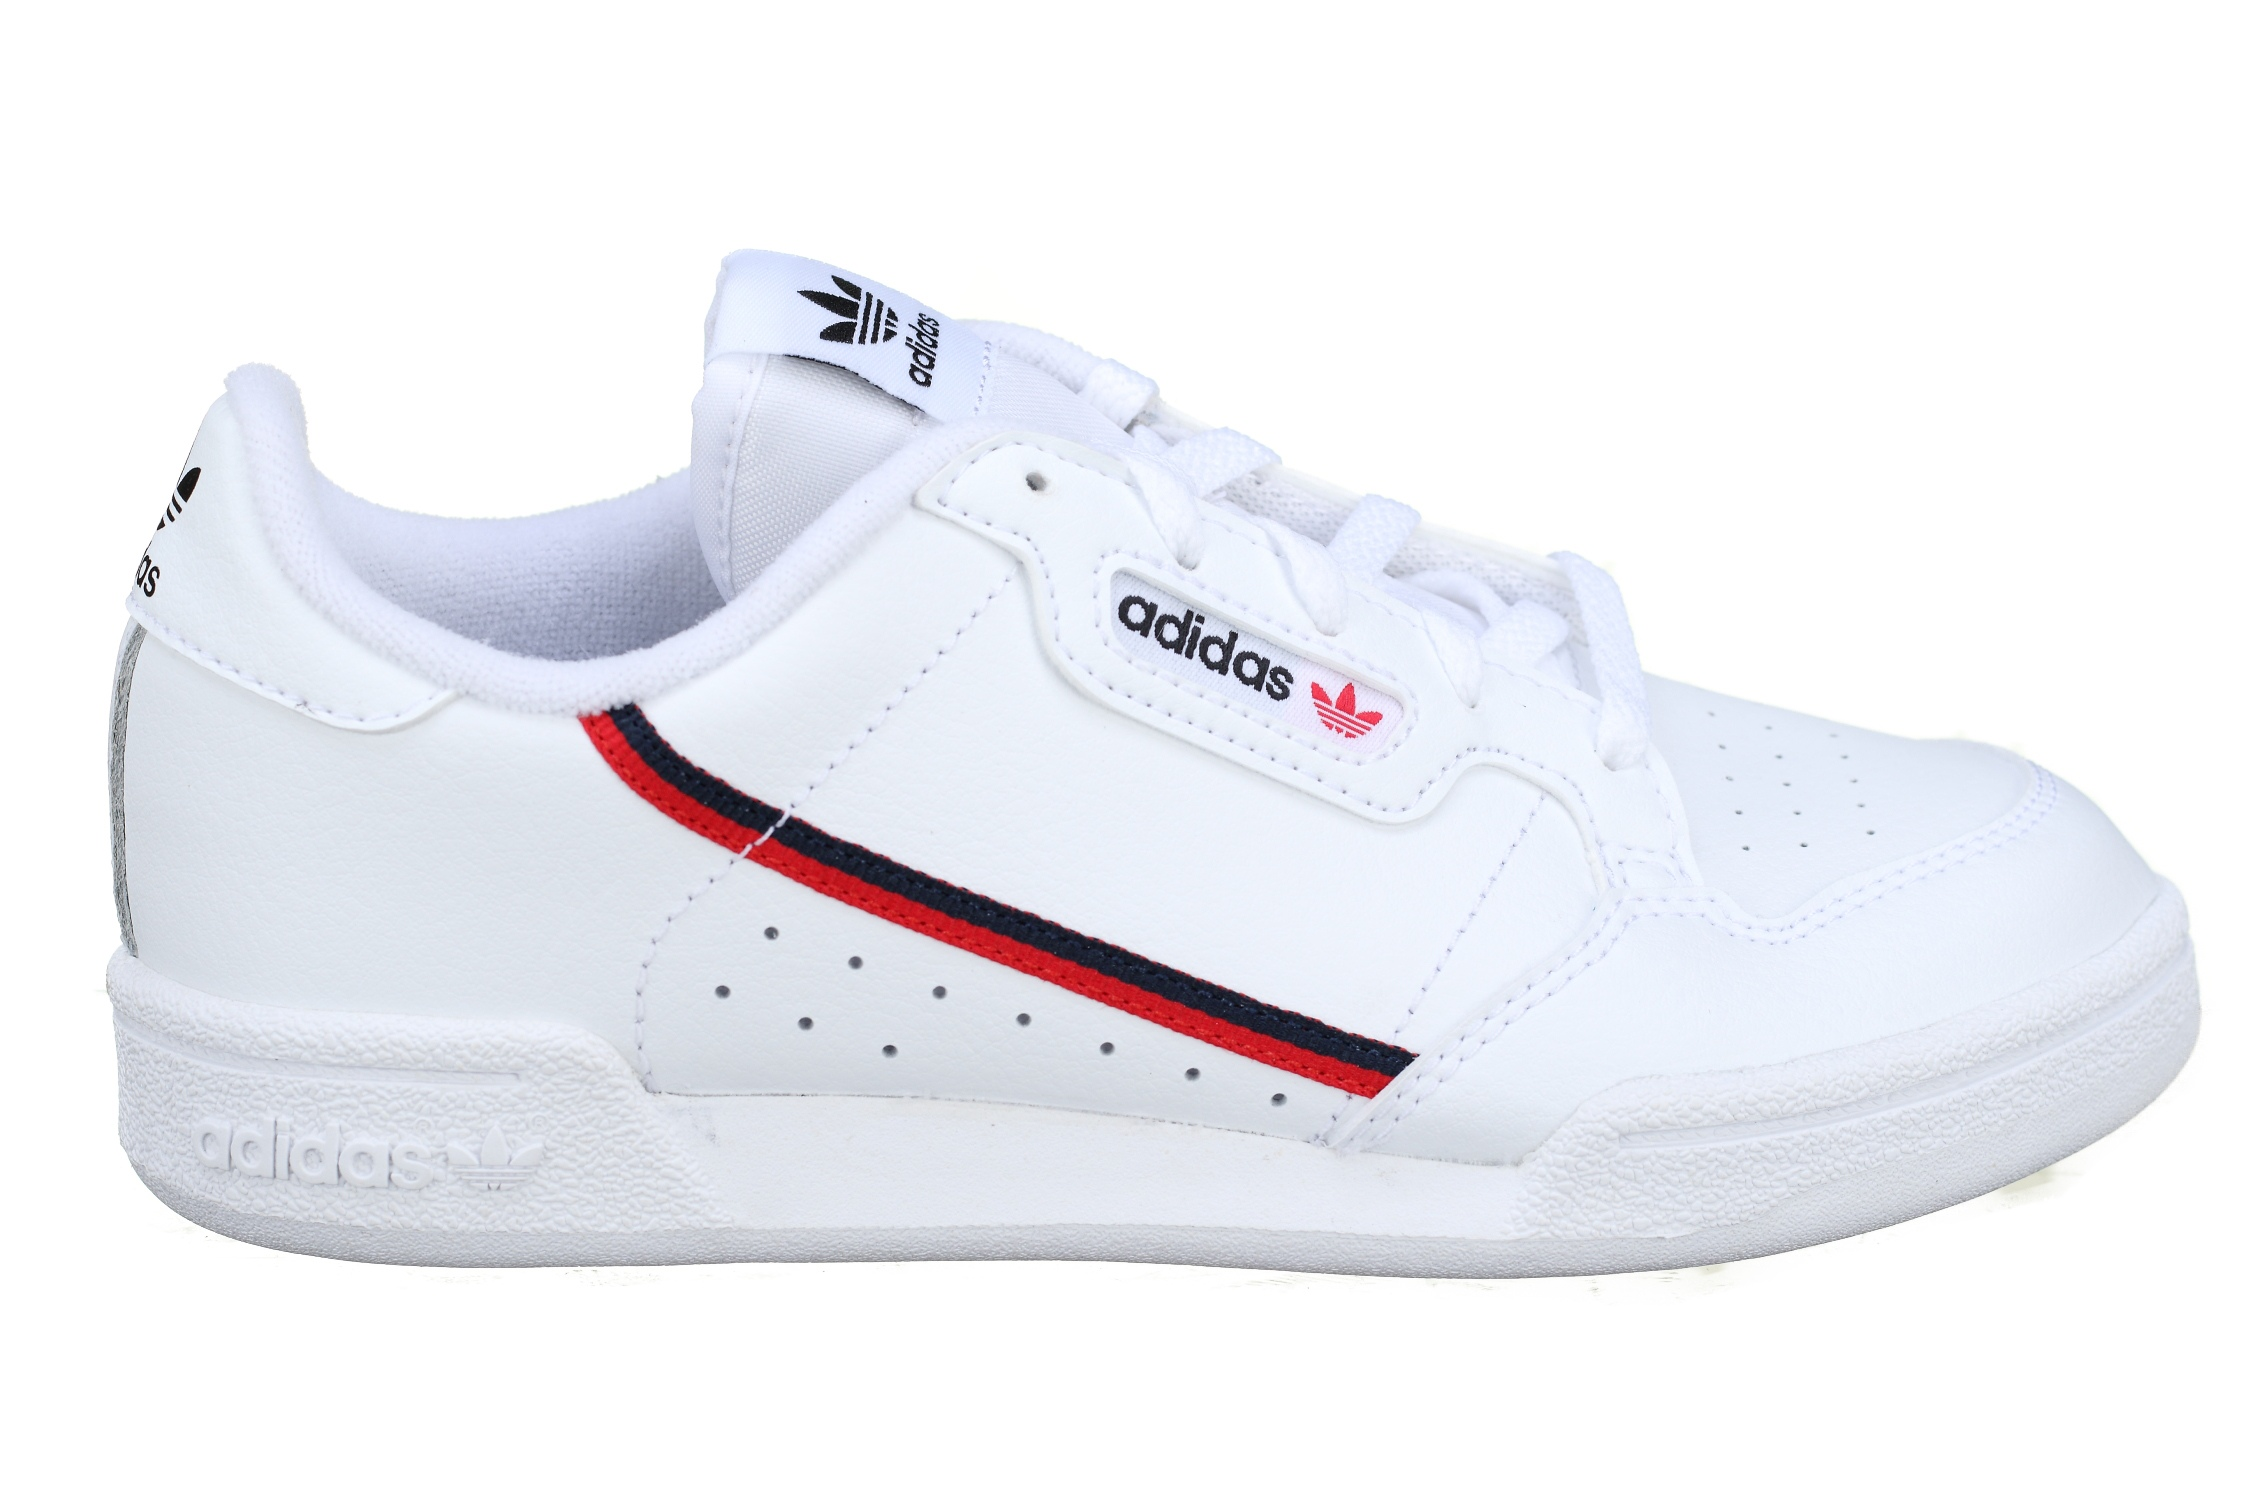 https://www.leadermode.com/163138/adidas-continental-80-c-g28215-blanc.jpg